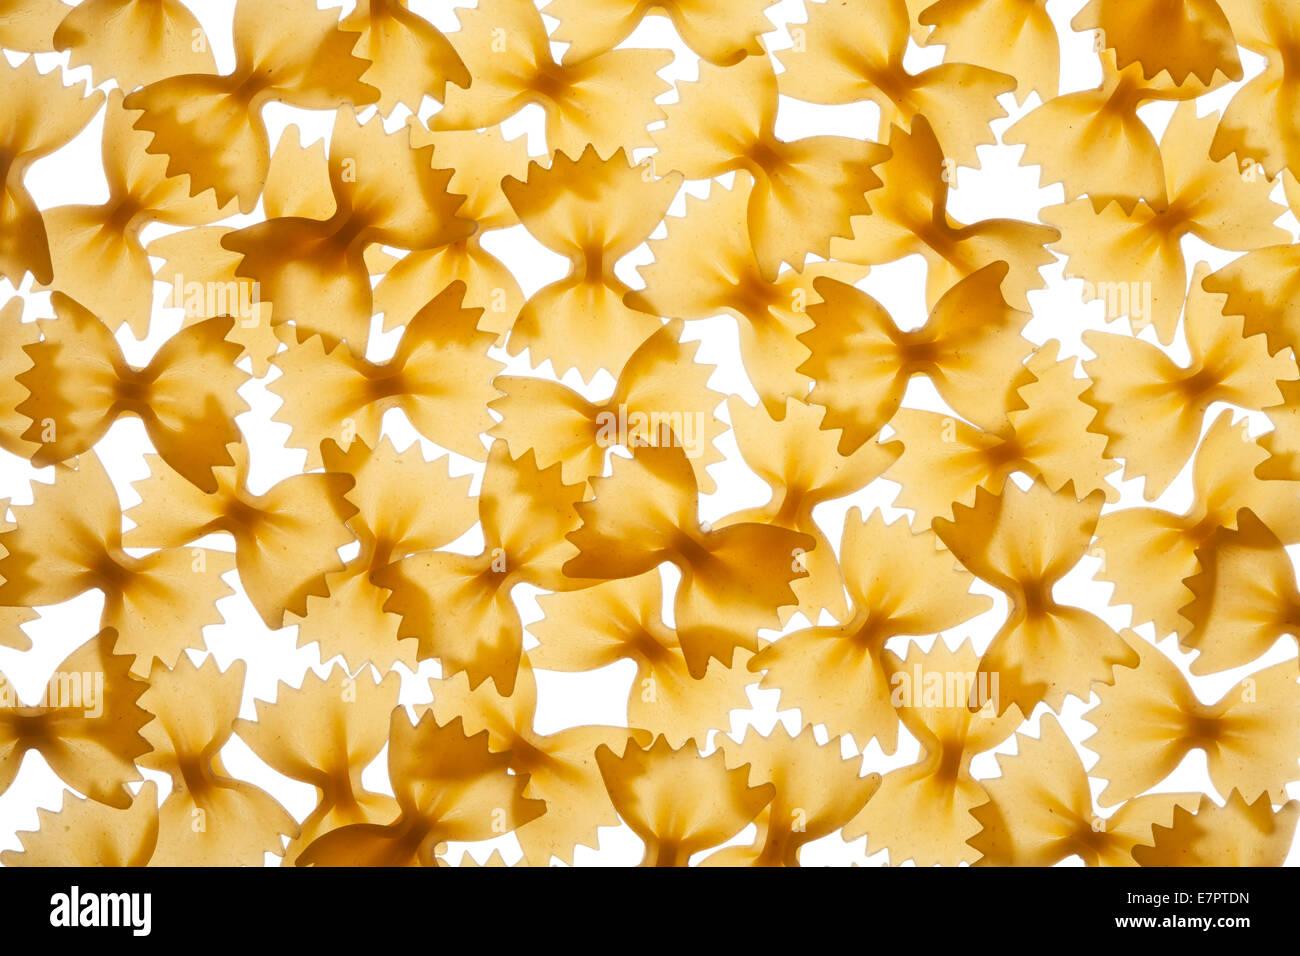 Italian raw pasta farfalle, bow tie, butterfly - Stock Image